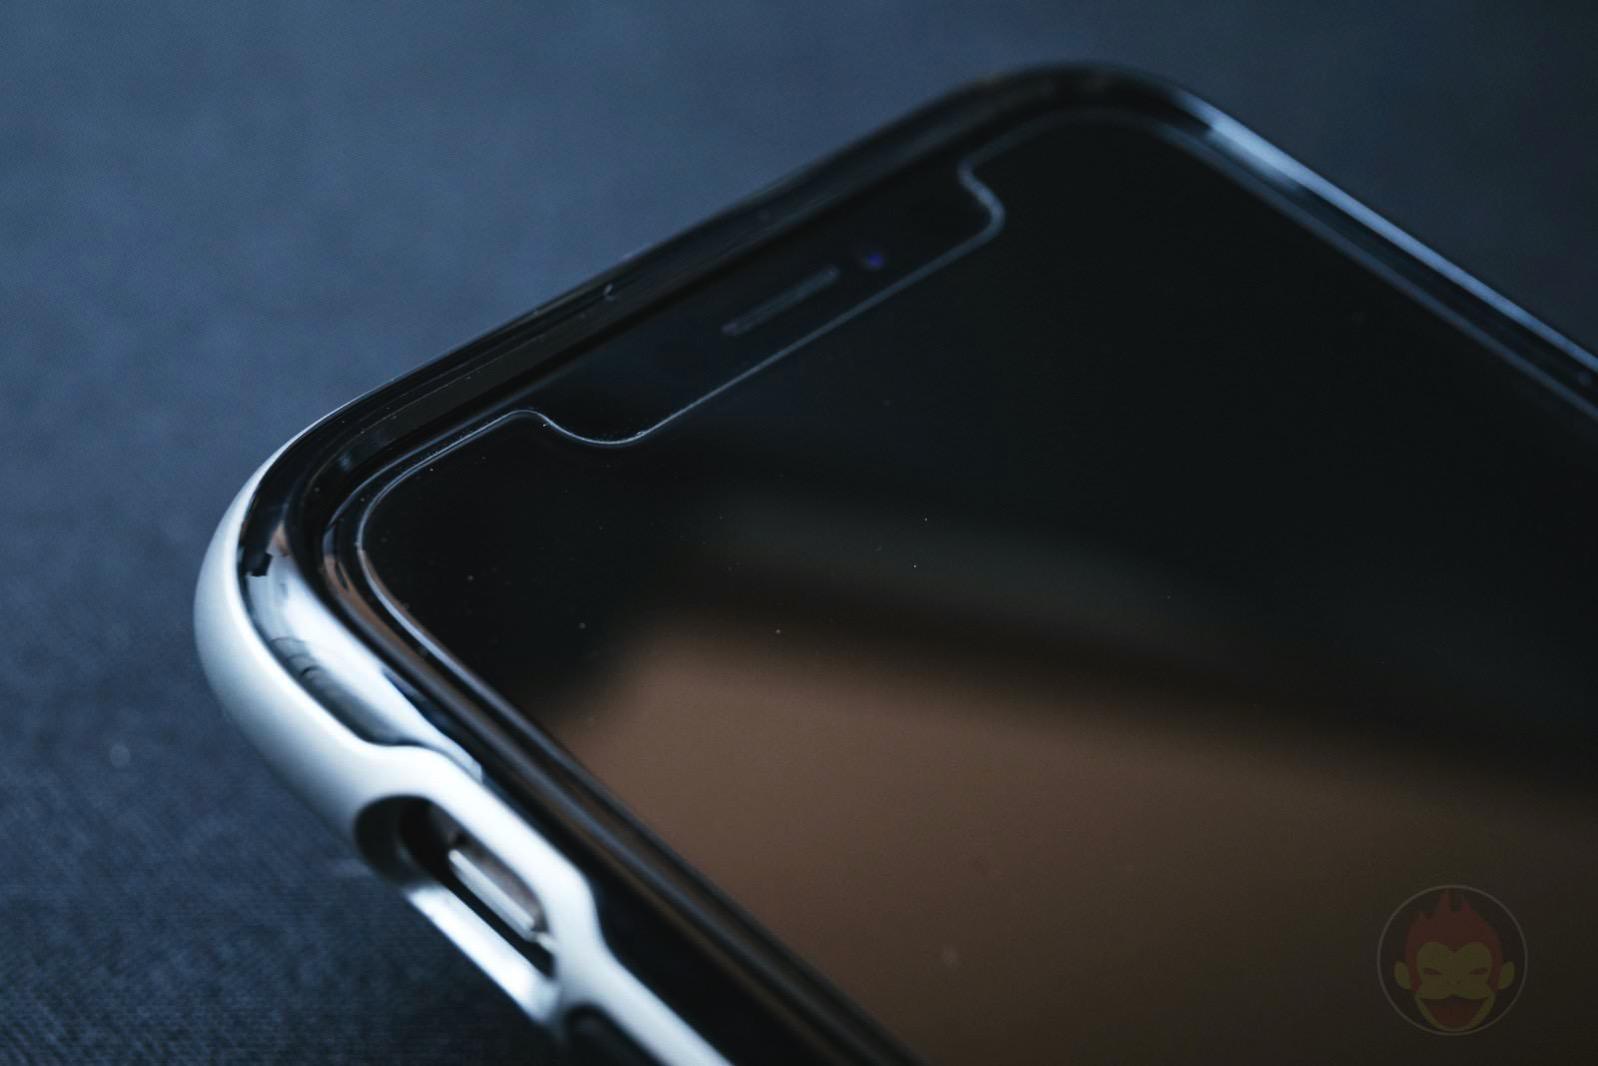 Spigen-iPhoenX-Case-Classic-One-06.jpg